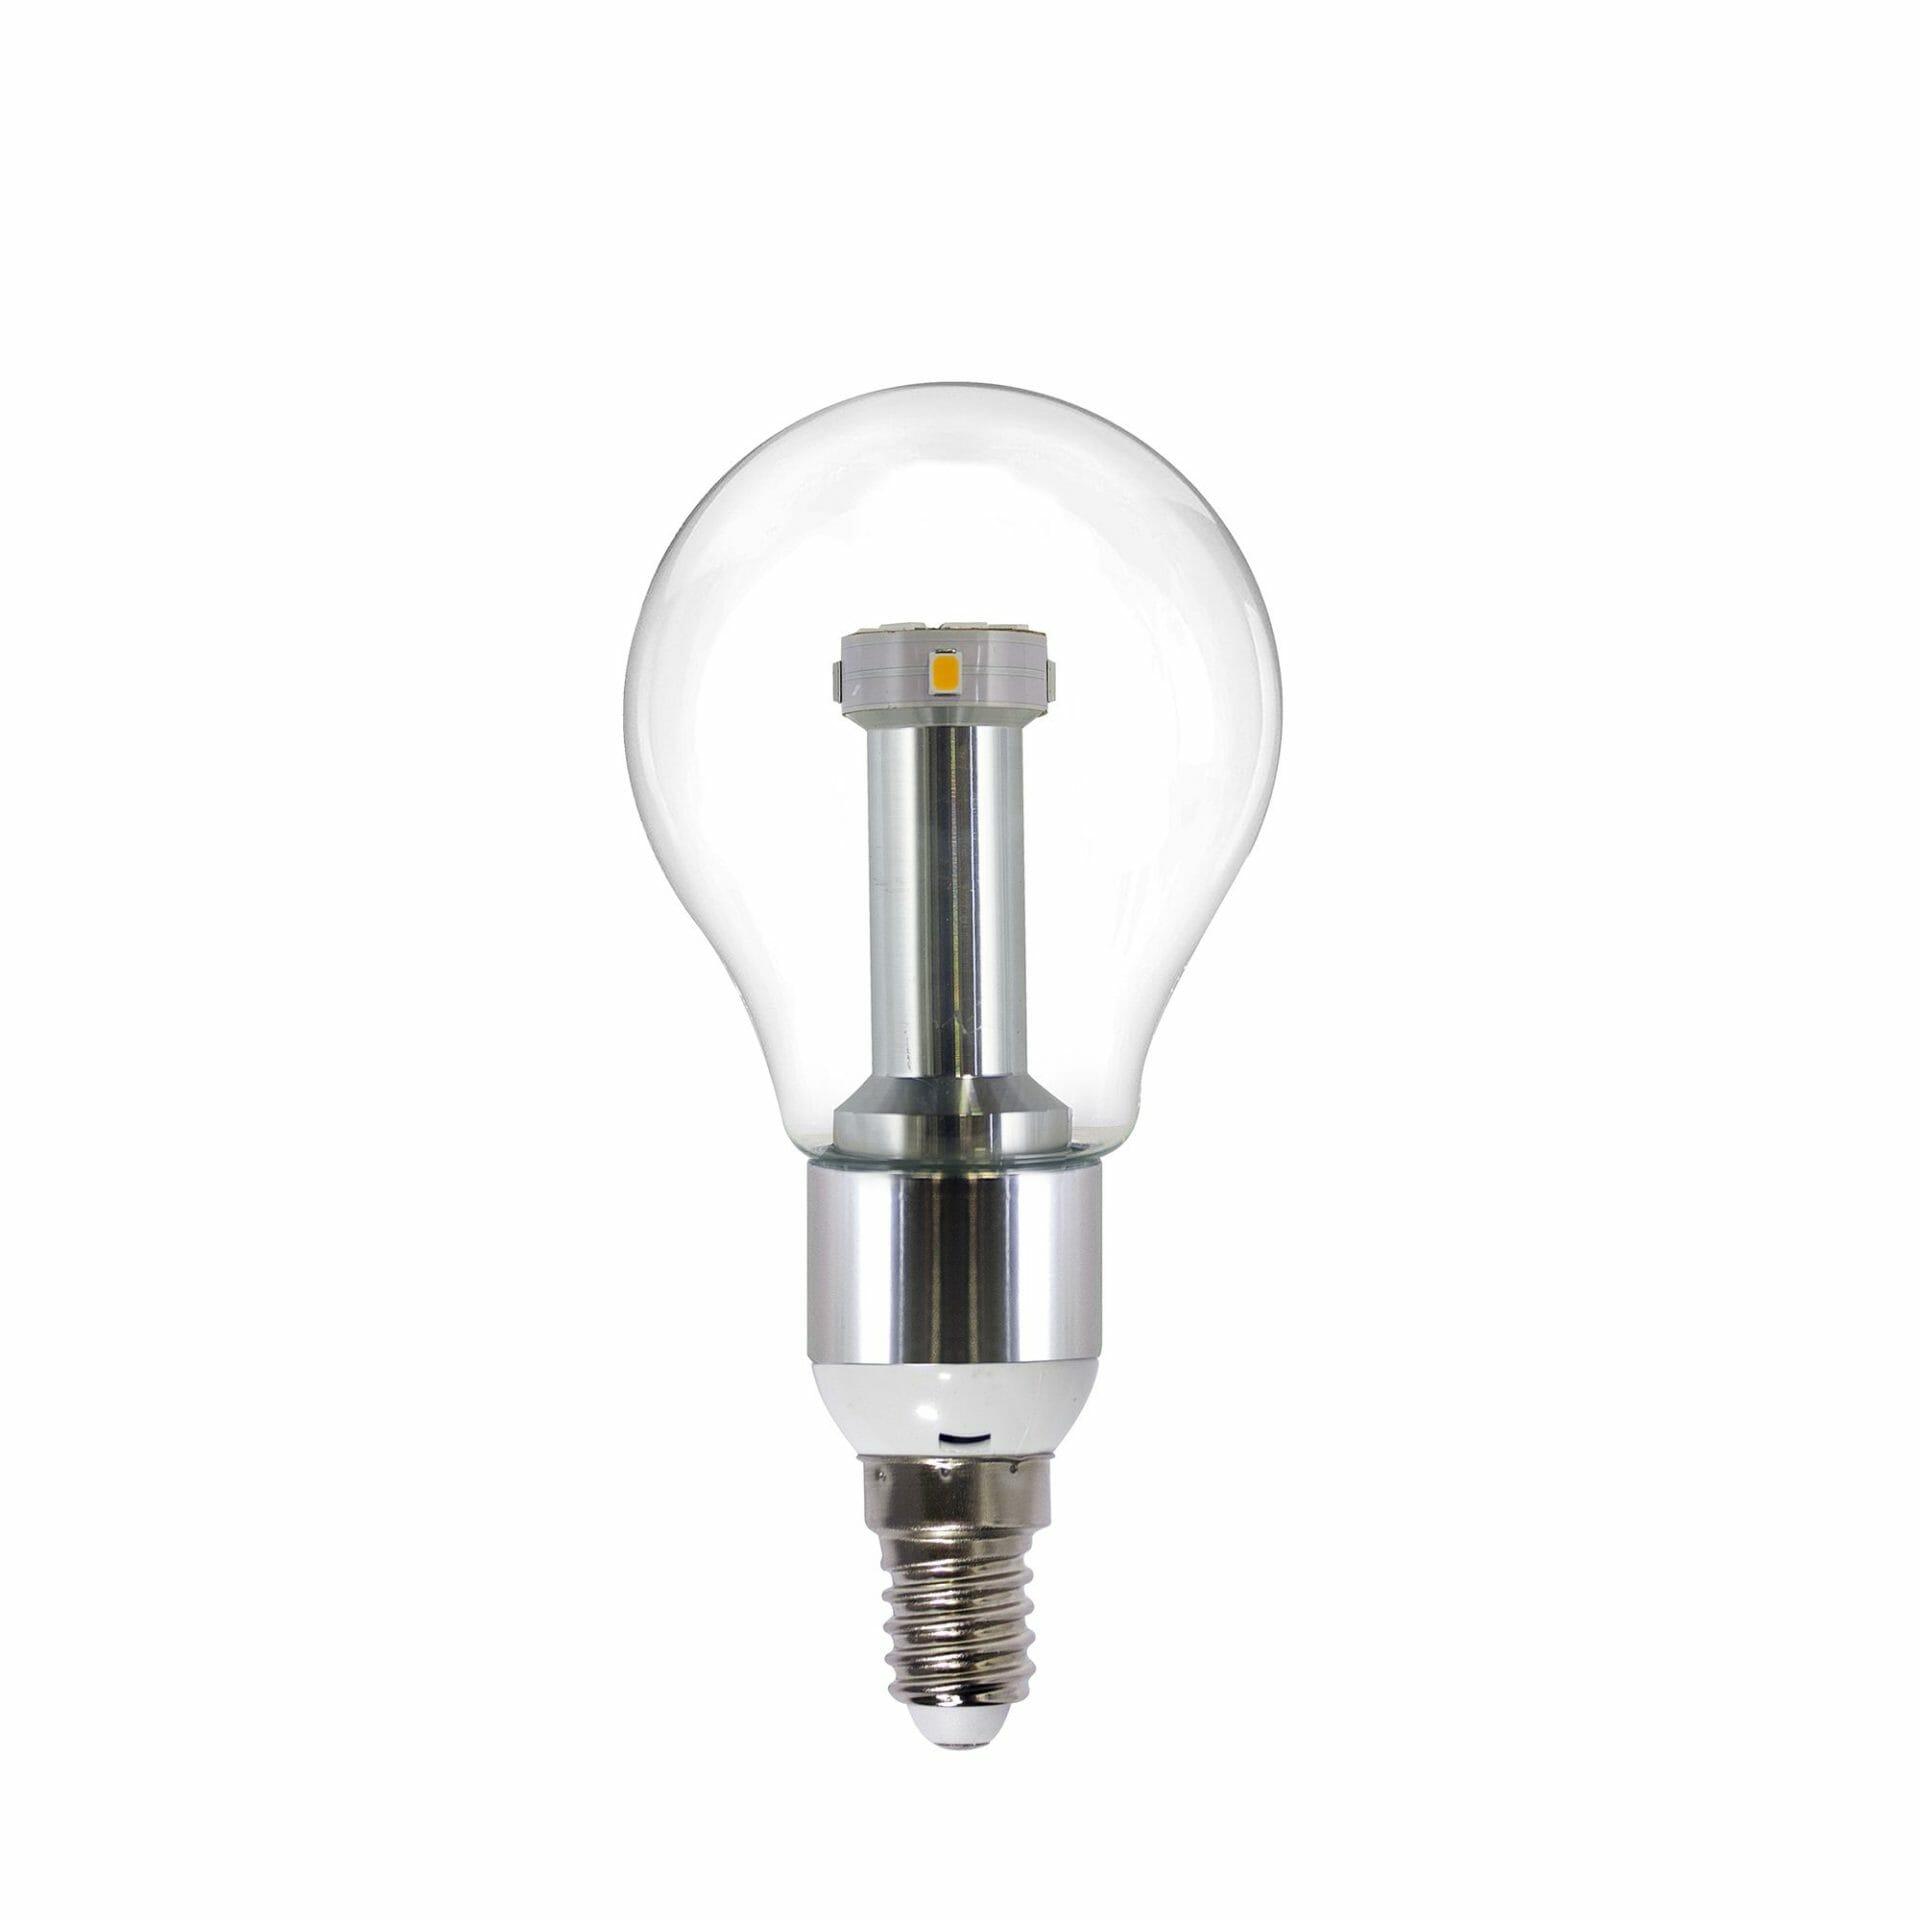 GS Solar LED Light Bulb A60 - 4+7 LED's